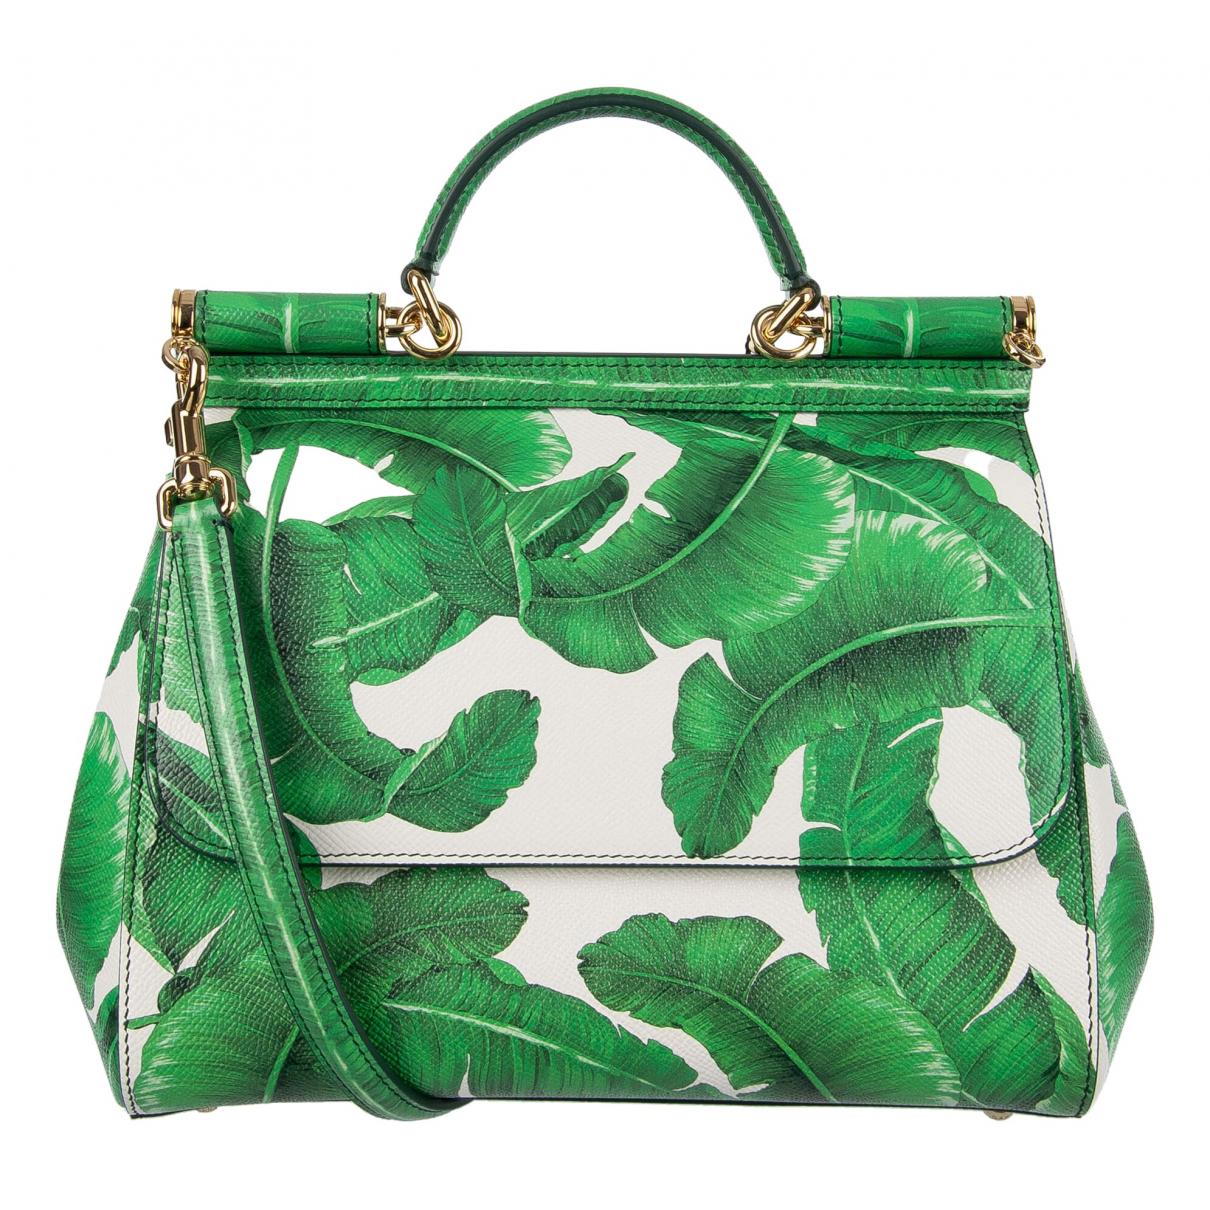 Dolce & Gabbana Sicily Green Leather handbag for Women \N